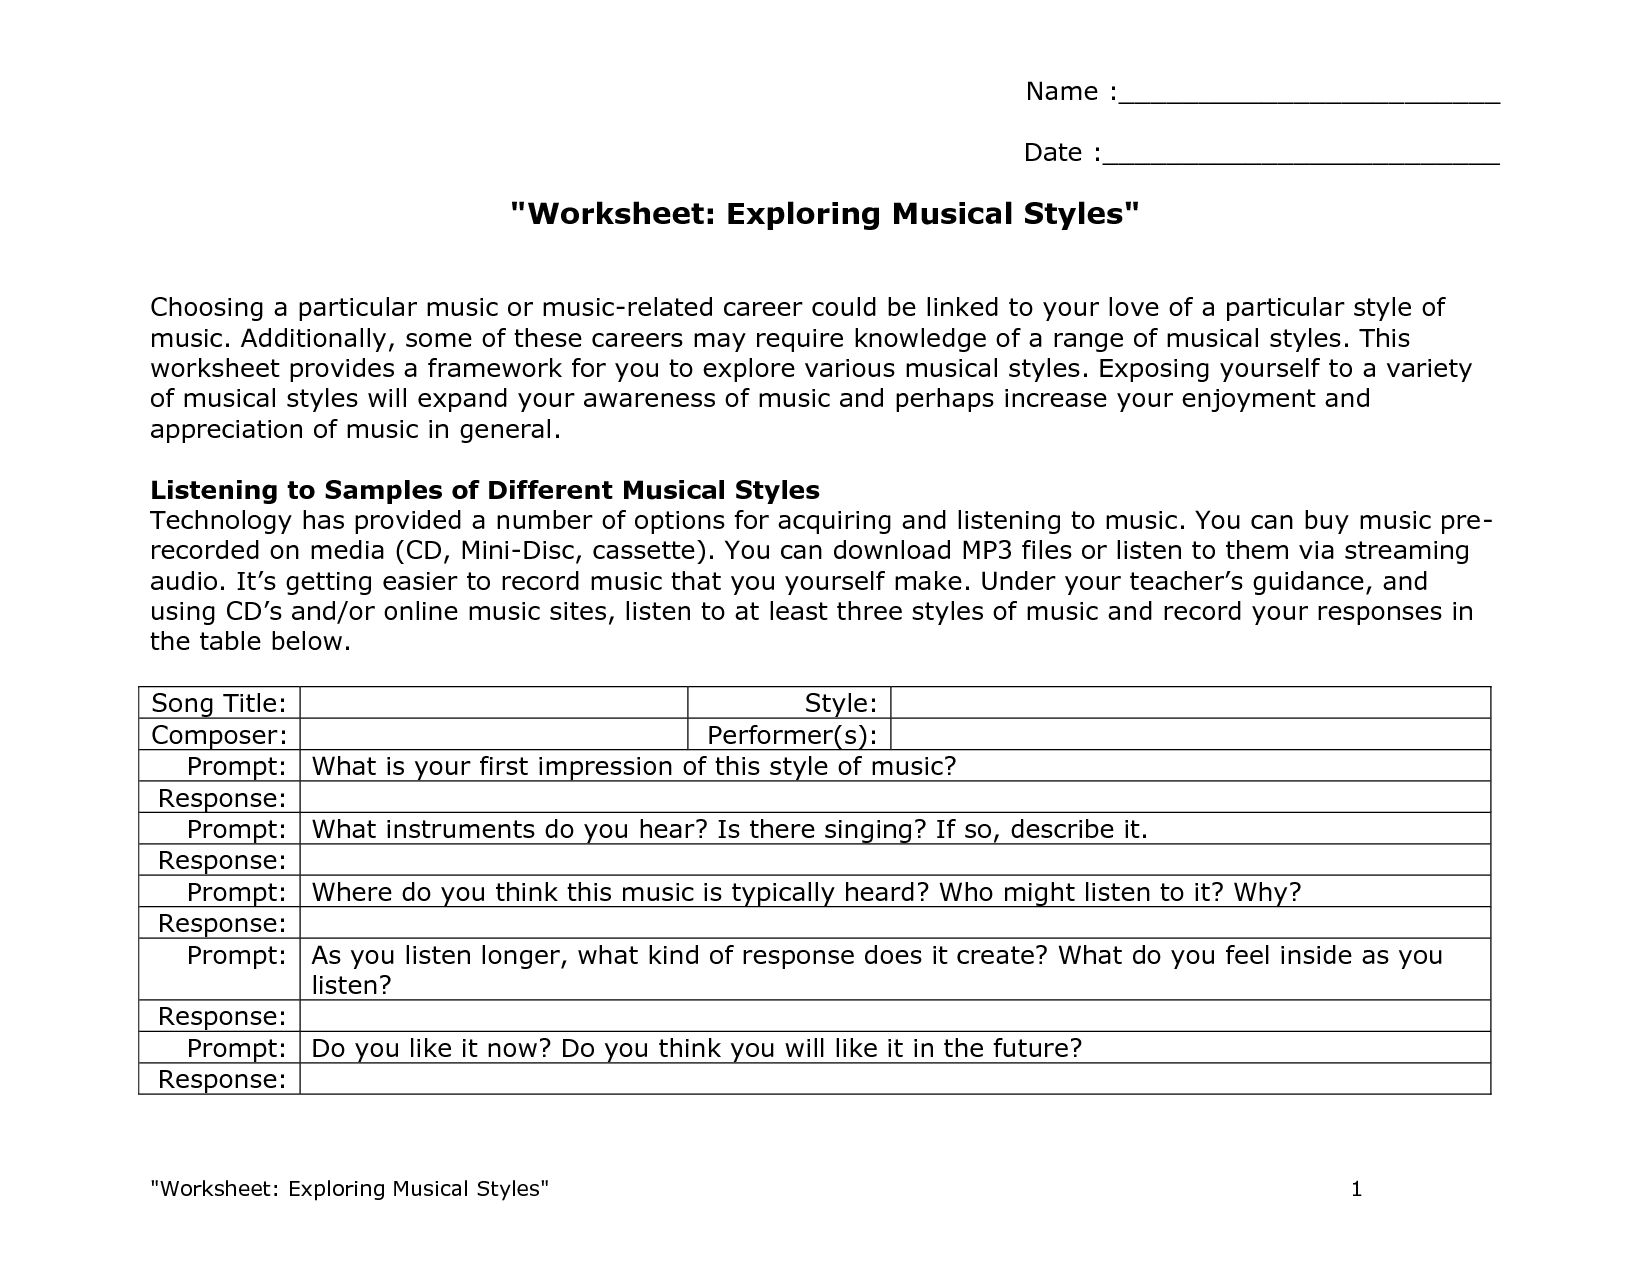 music genre worksheets   Worksheet Exploring Musical Styles   Music  assessments [ 1275 x 1650 Pixel ]